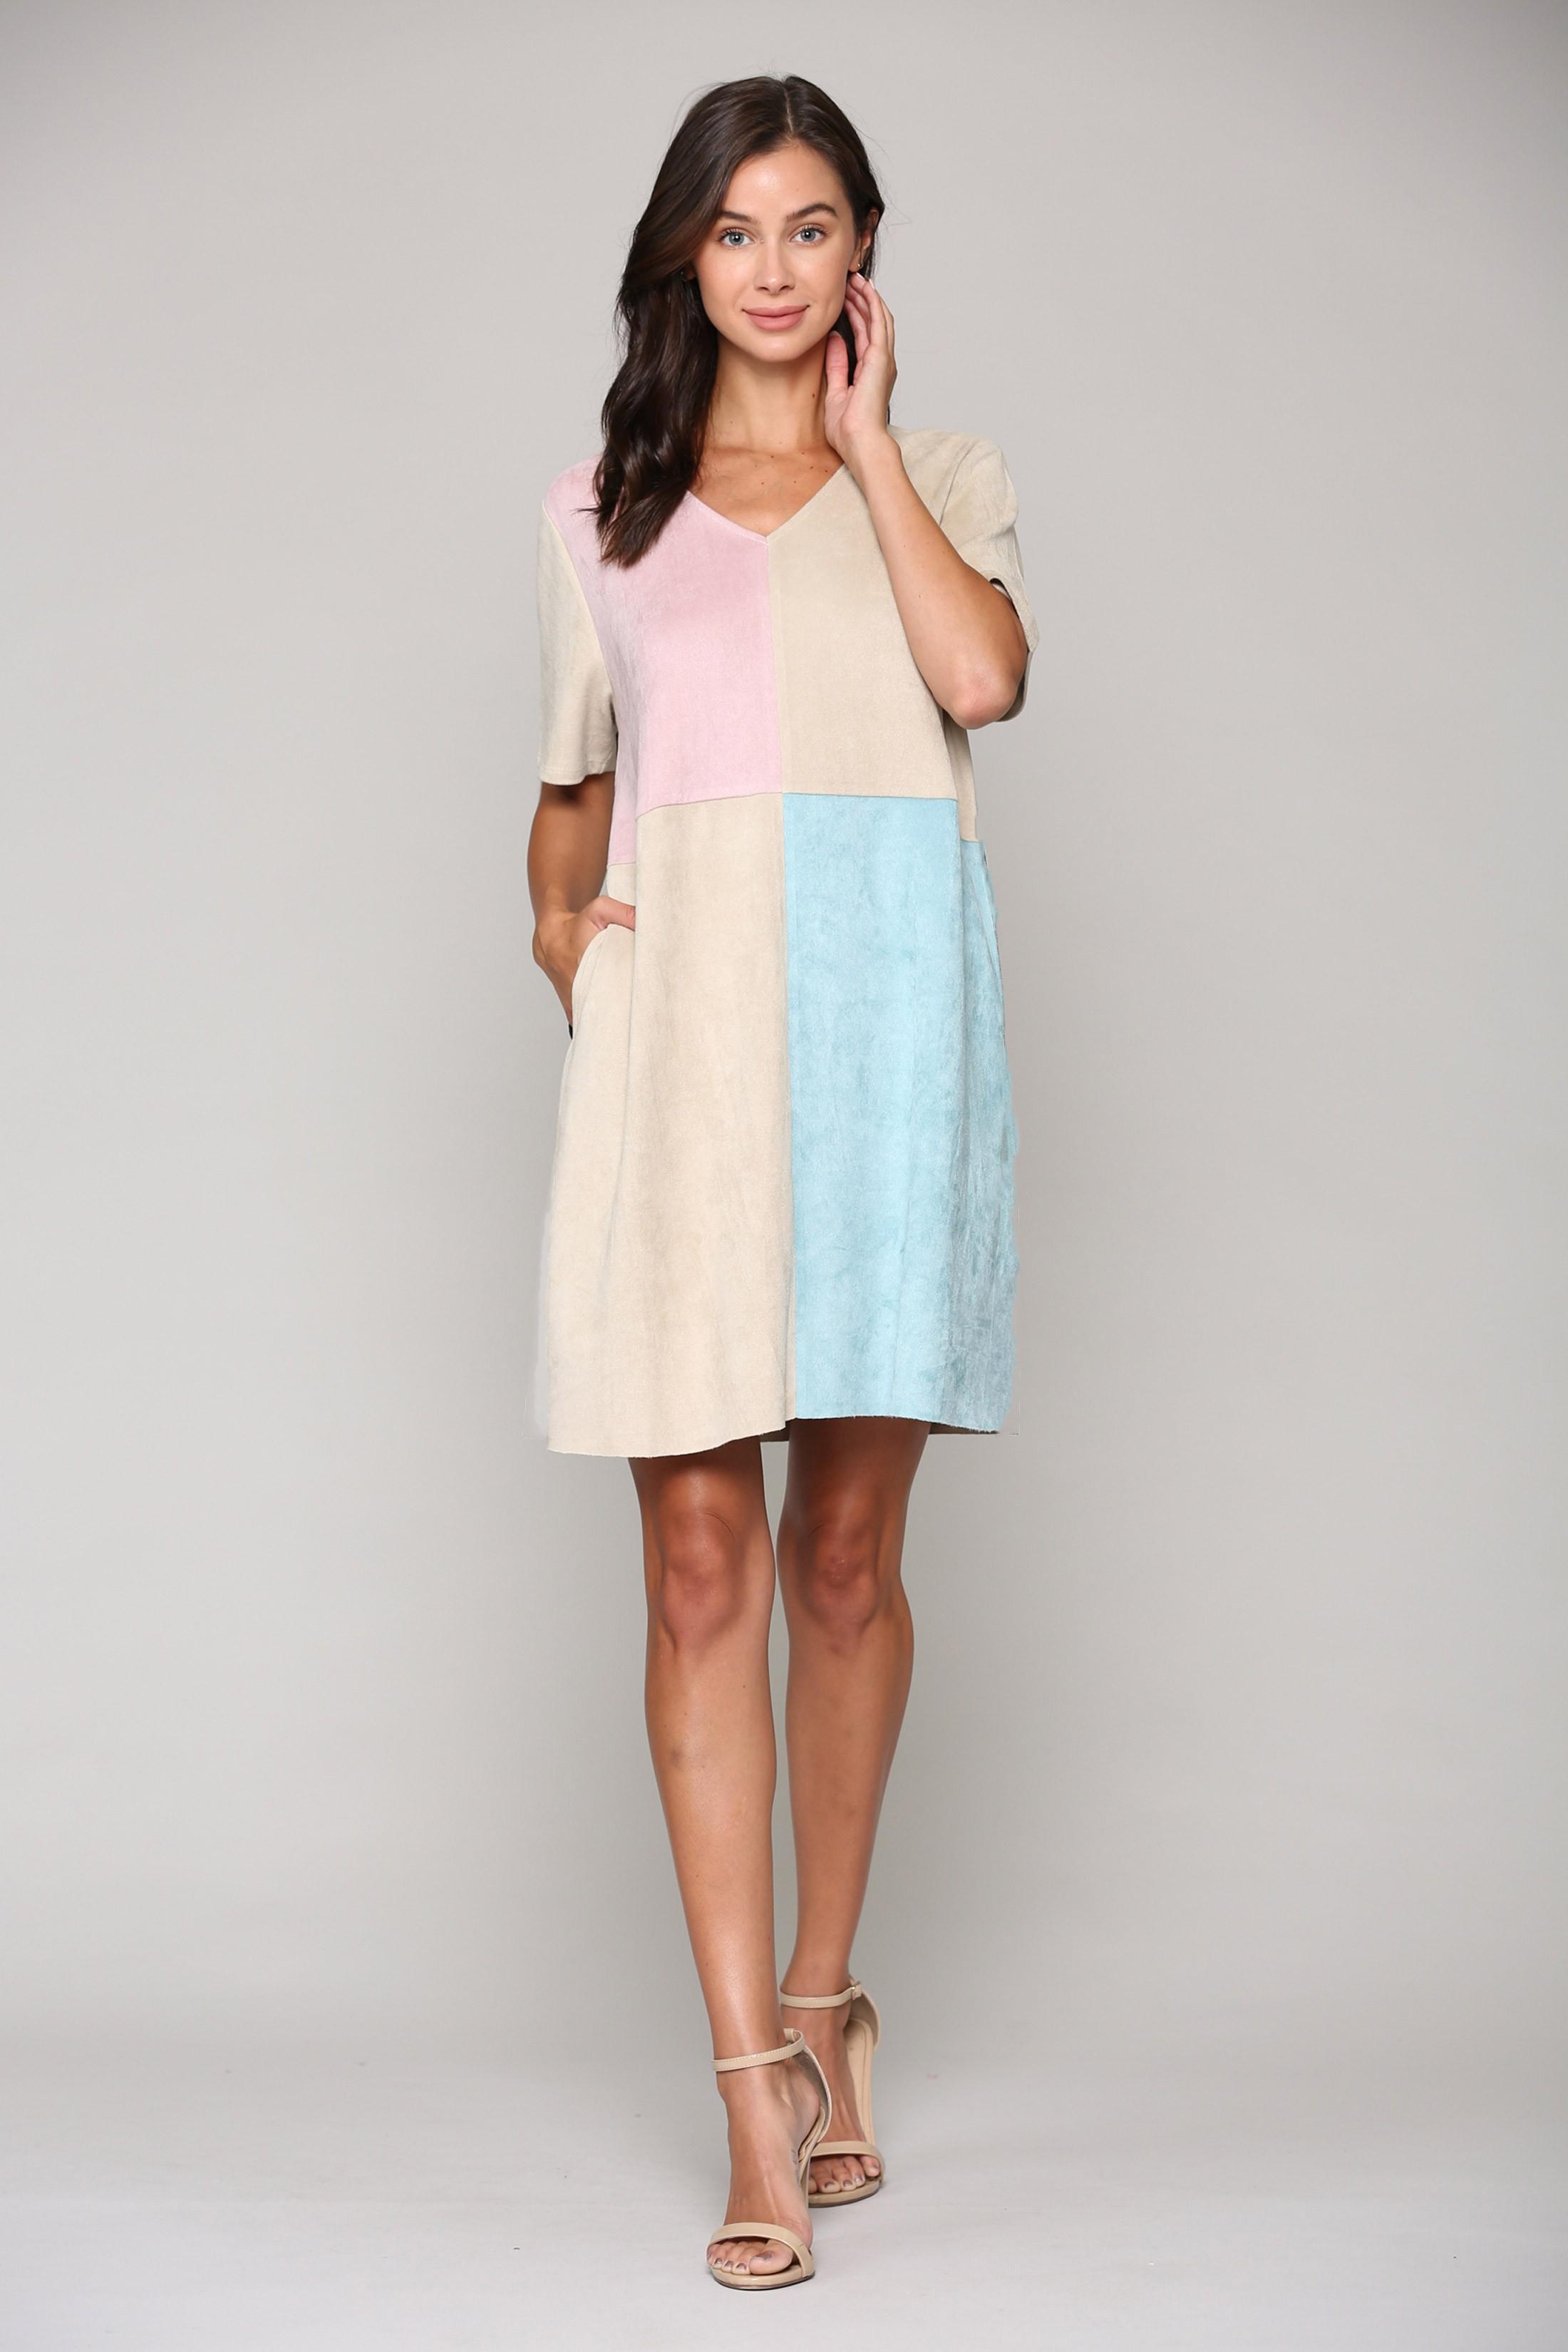 Annelise Multi-Color Tunic Dress -Multi - Front